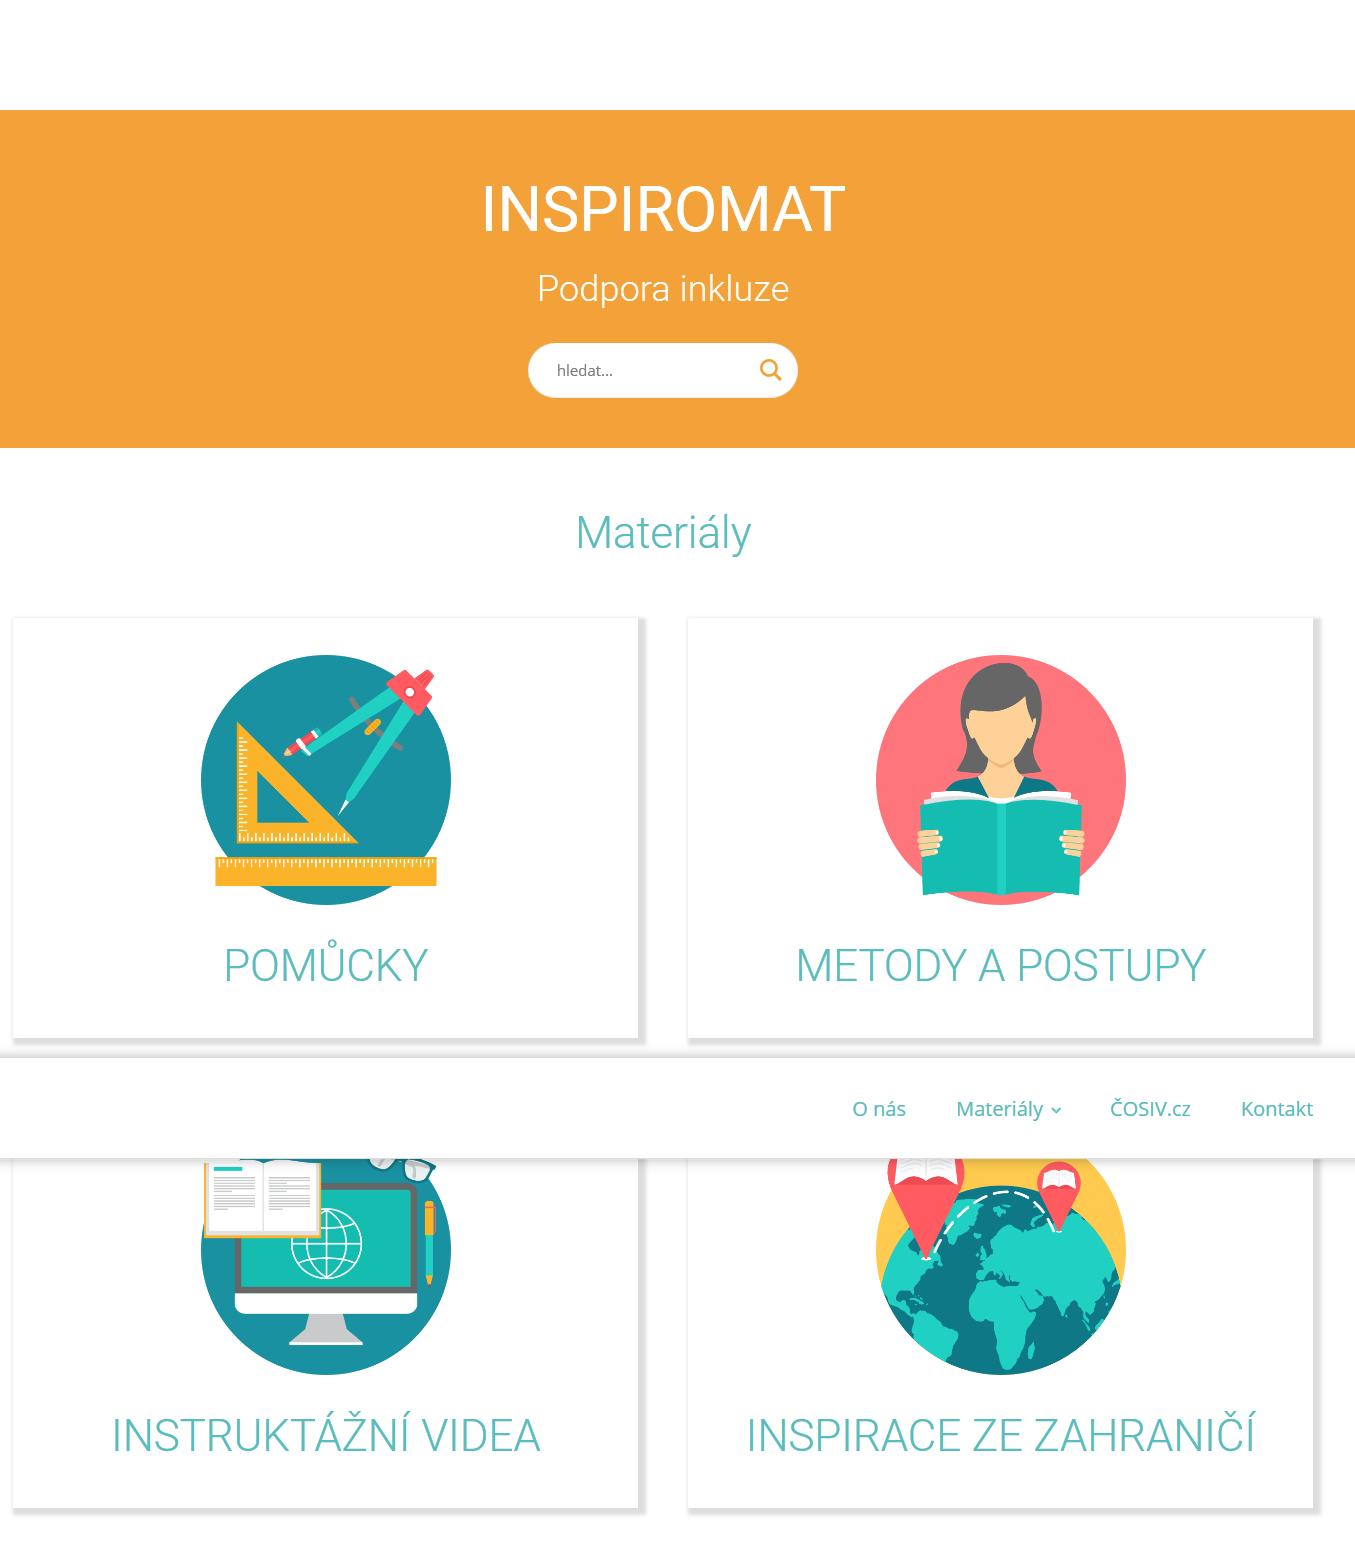 Inspiromat – podpora inkluze v praxi